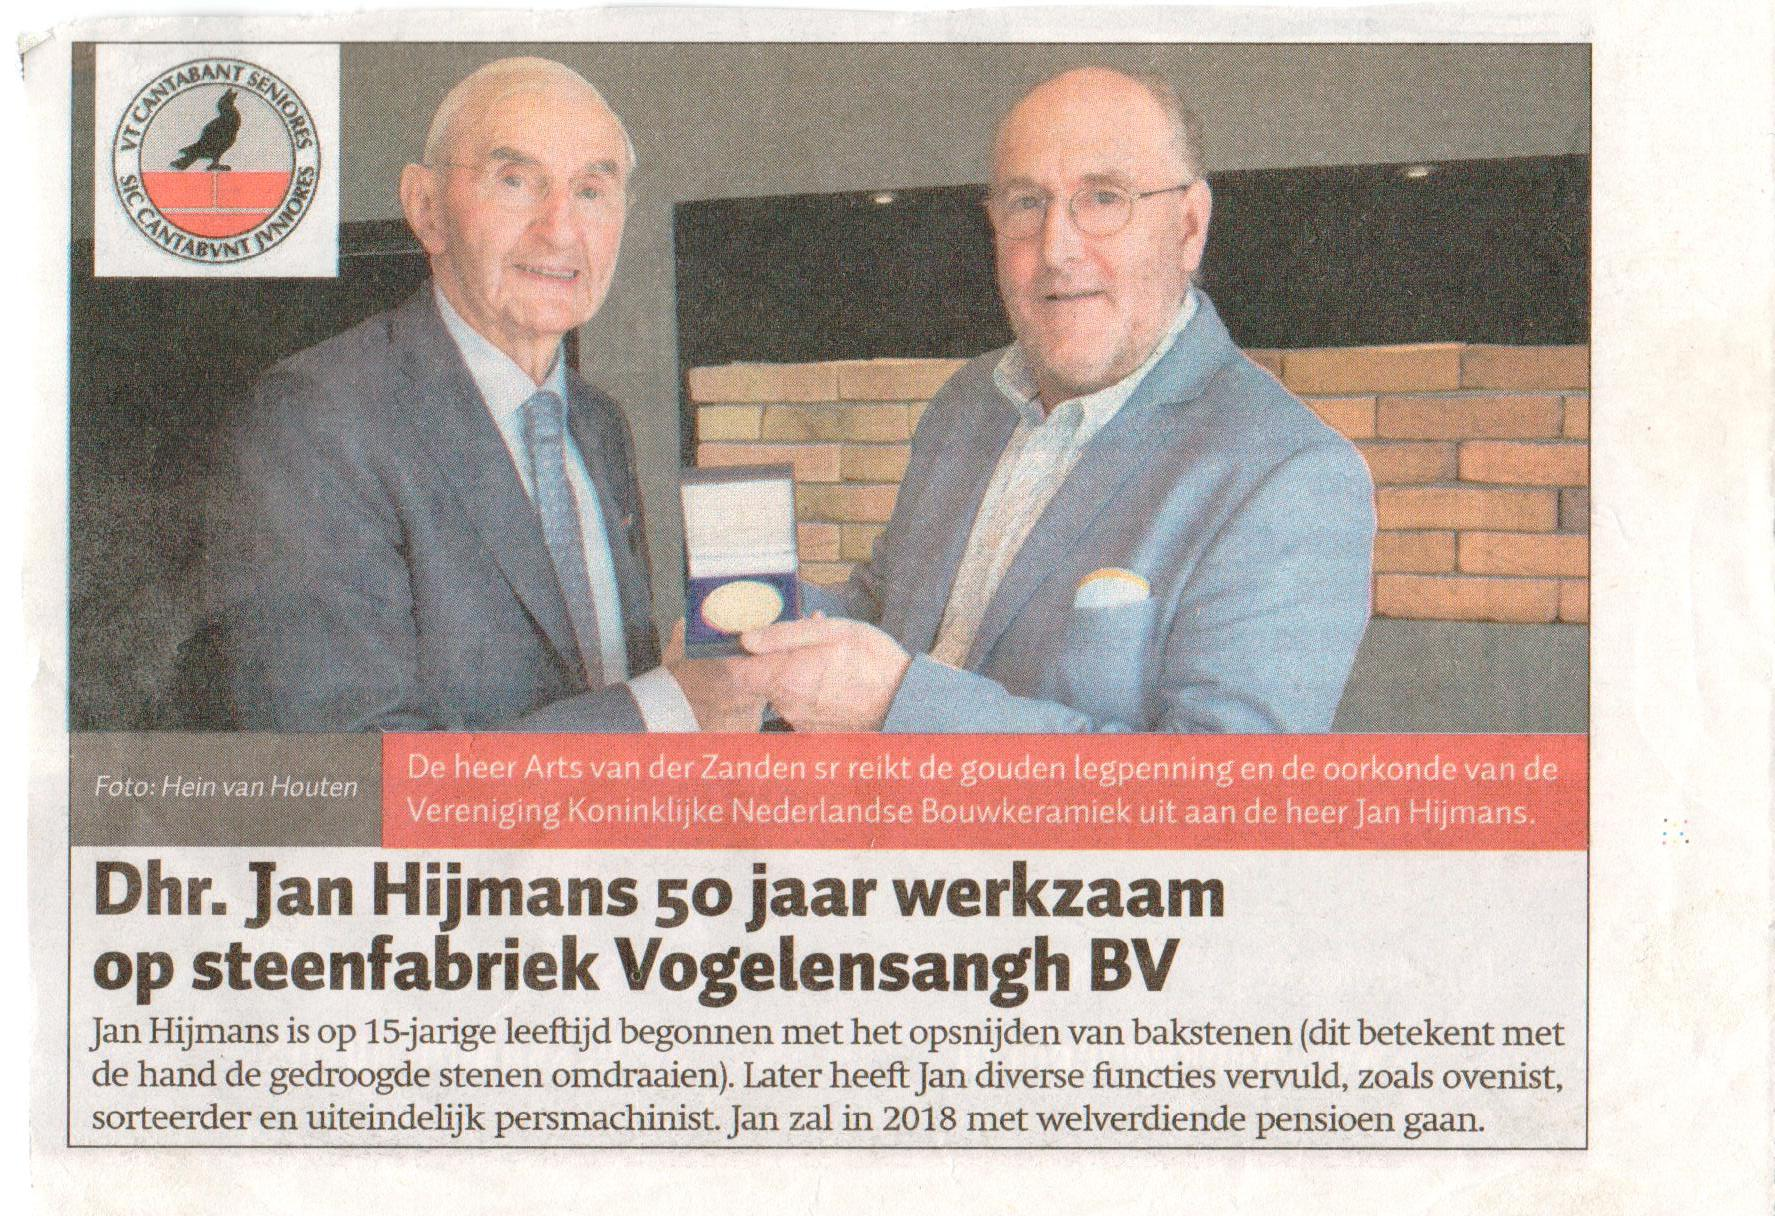 Jan Hijmans 50 jaar in dienst